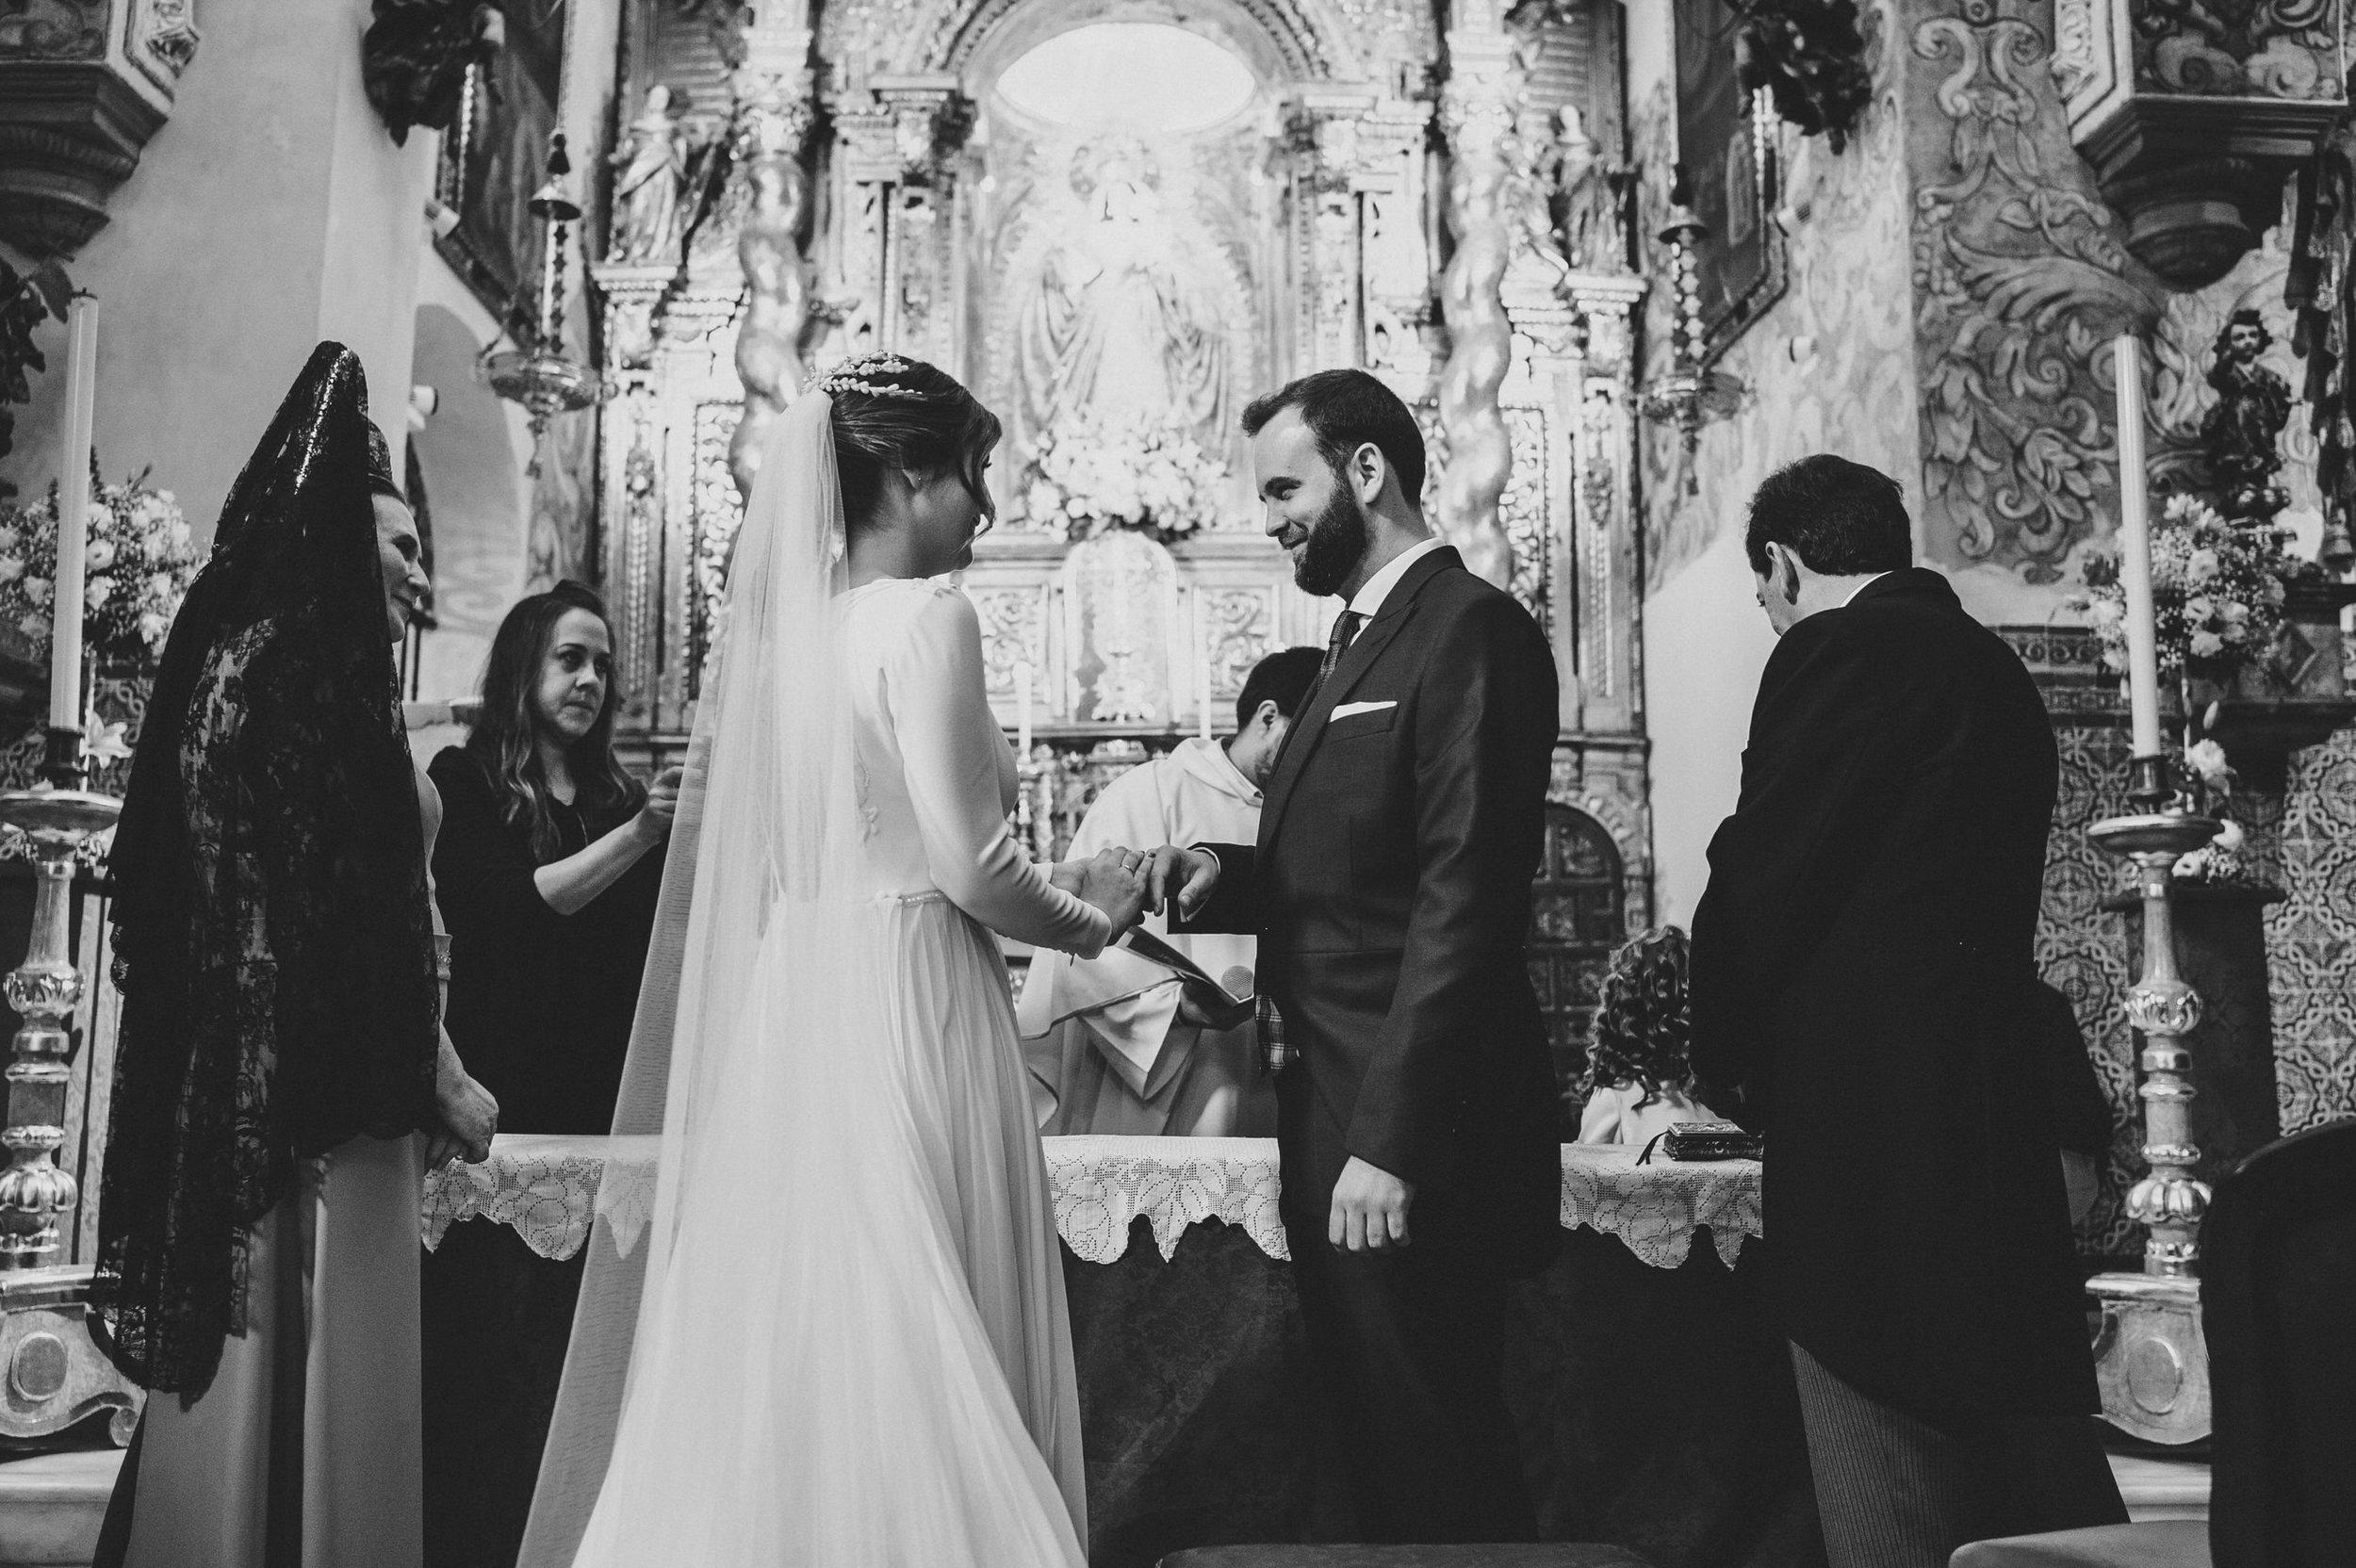 andres+amarillo+fotografo+boda+sevilla+santa+maria+de+la+blanca+al+yamanah (47).JPG